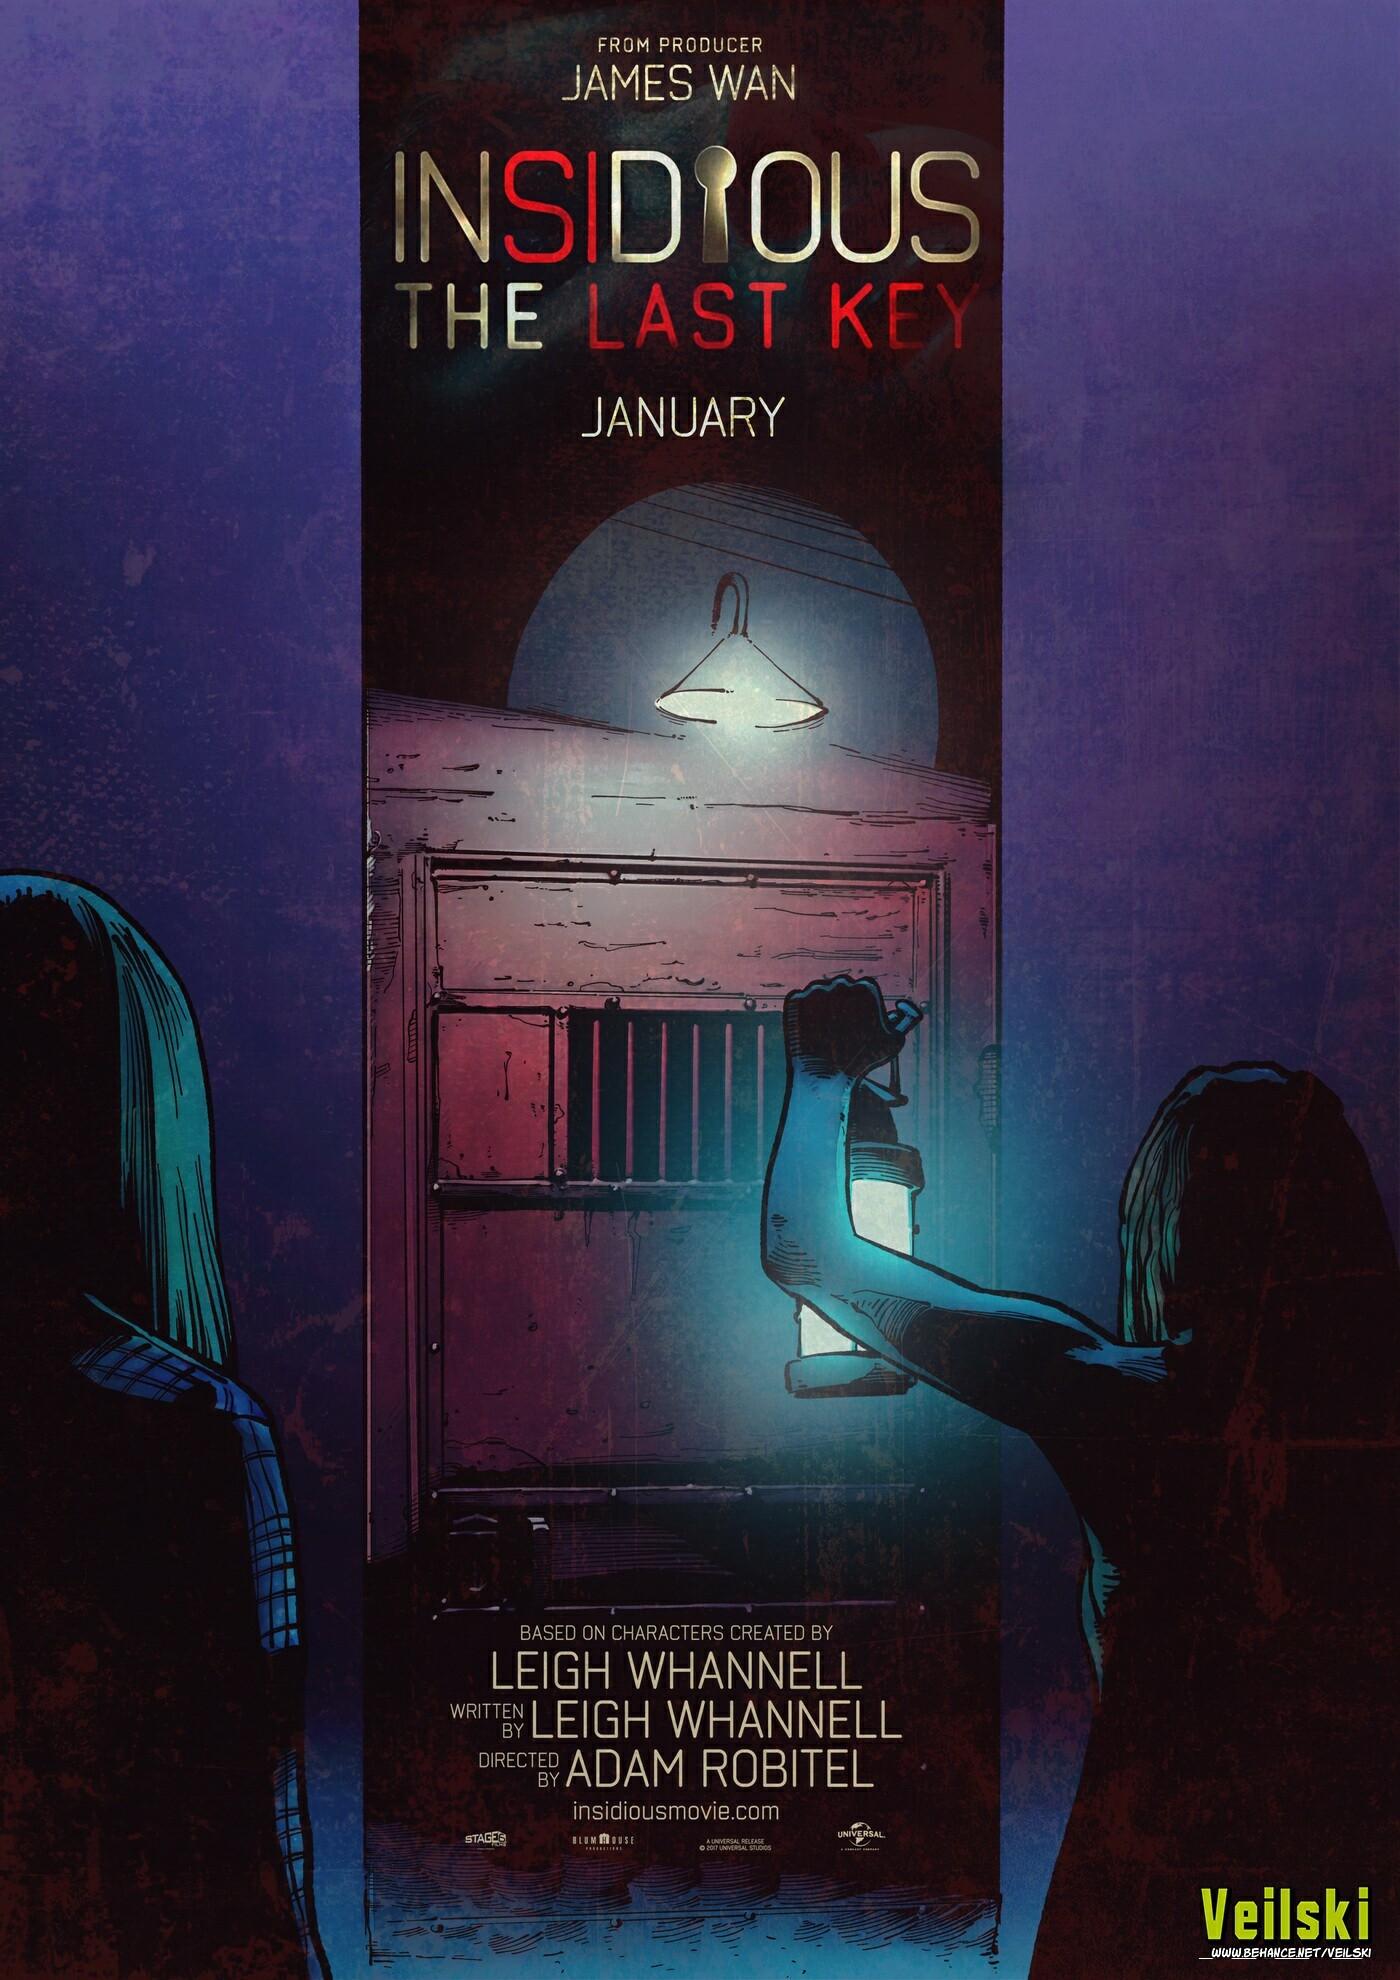 Insidious The Last Key alternative poster